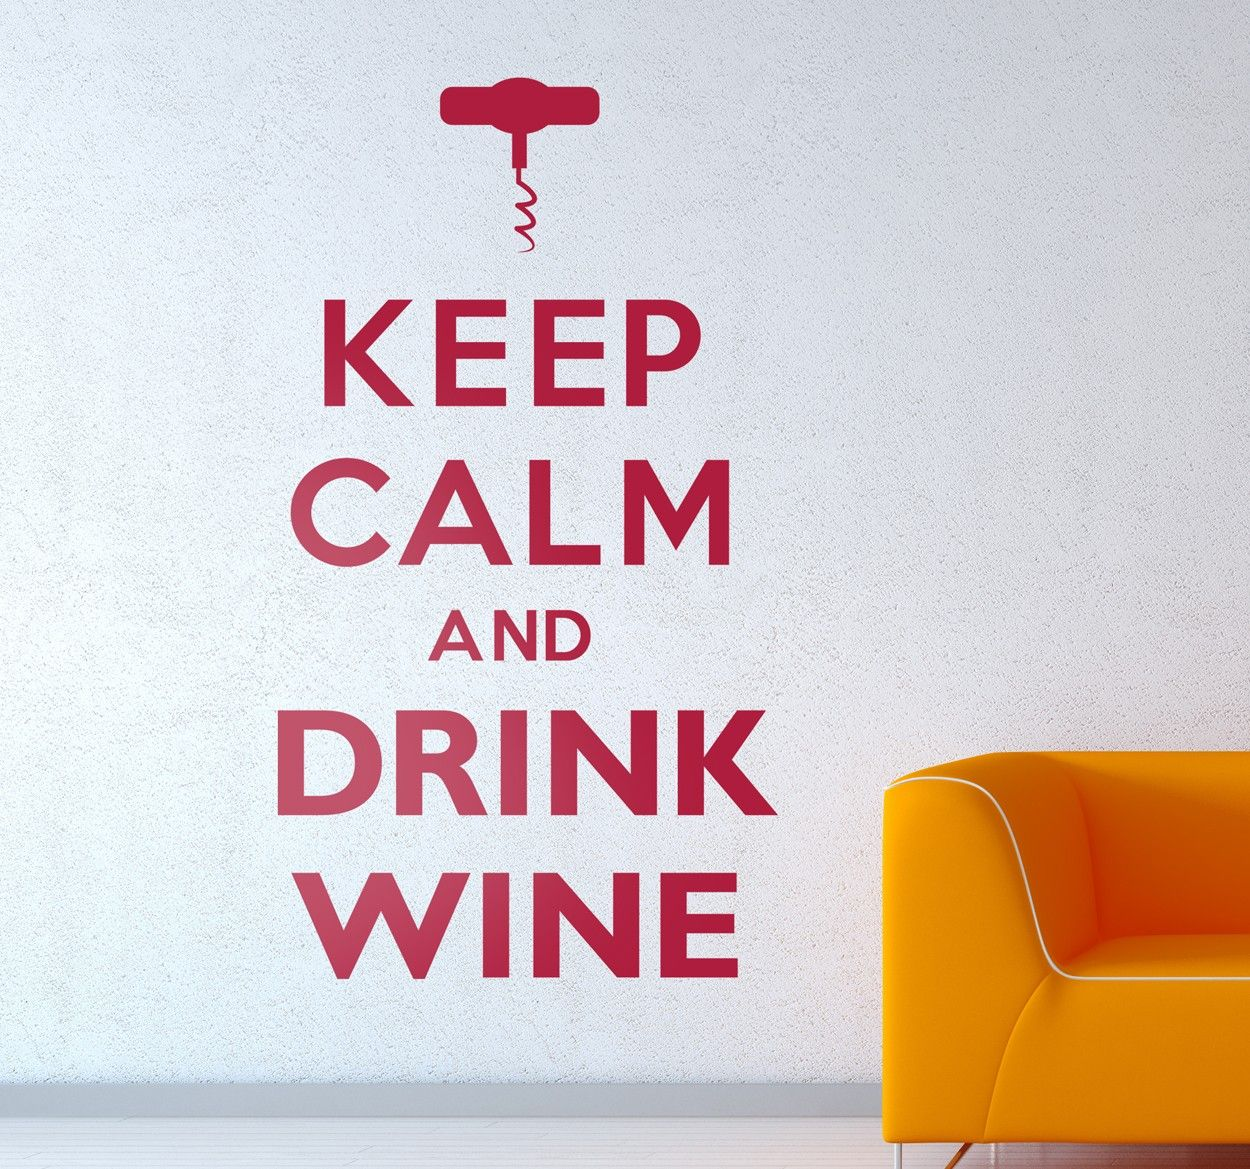 vinilo-decorativo-calm-drink-wine-7622.jpg (1250×1169)